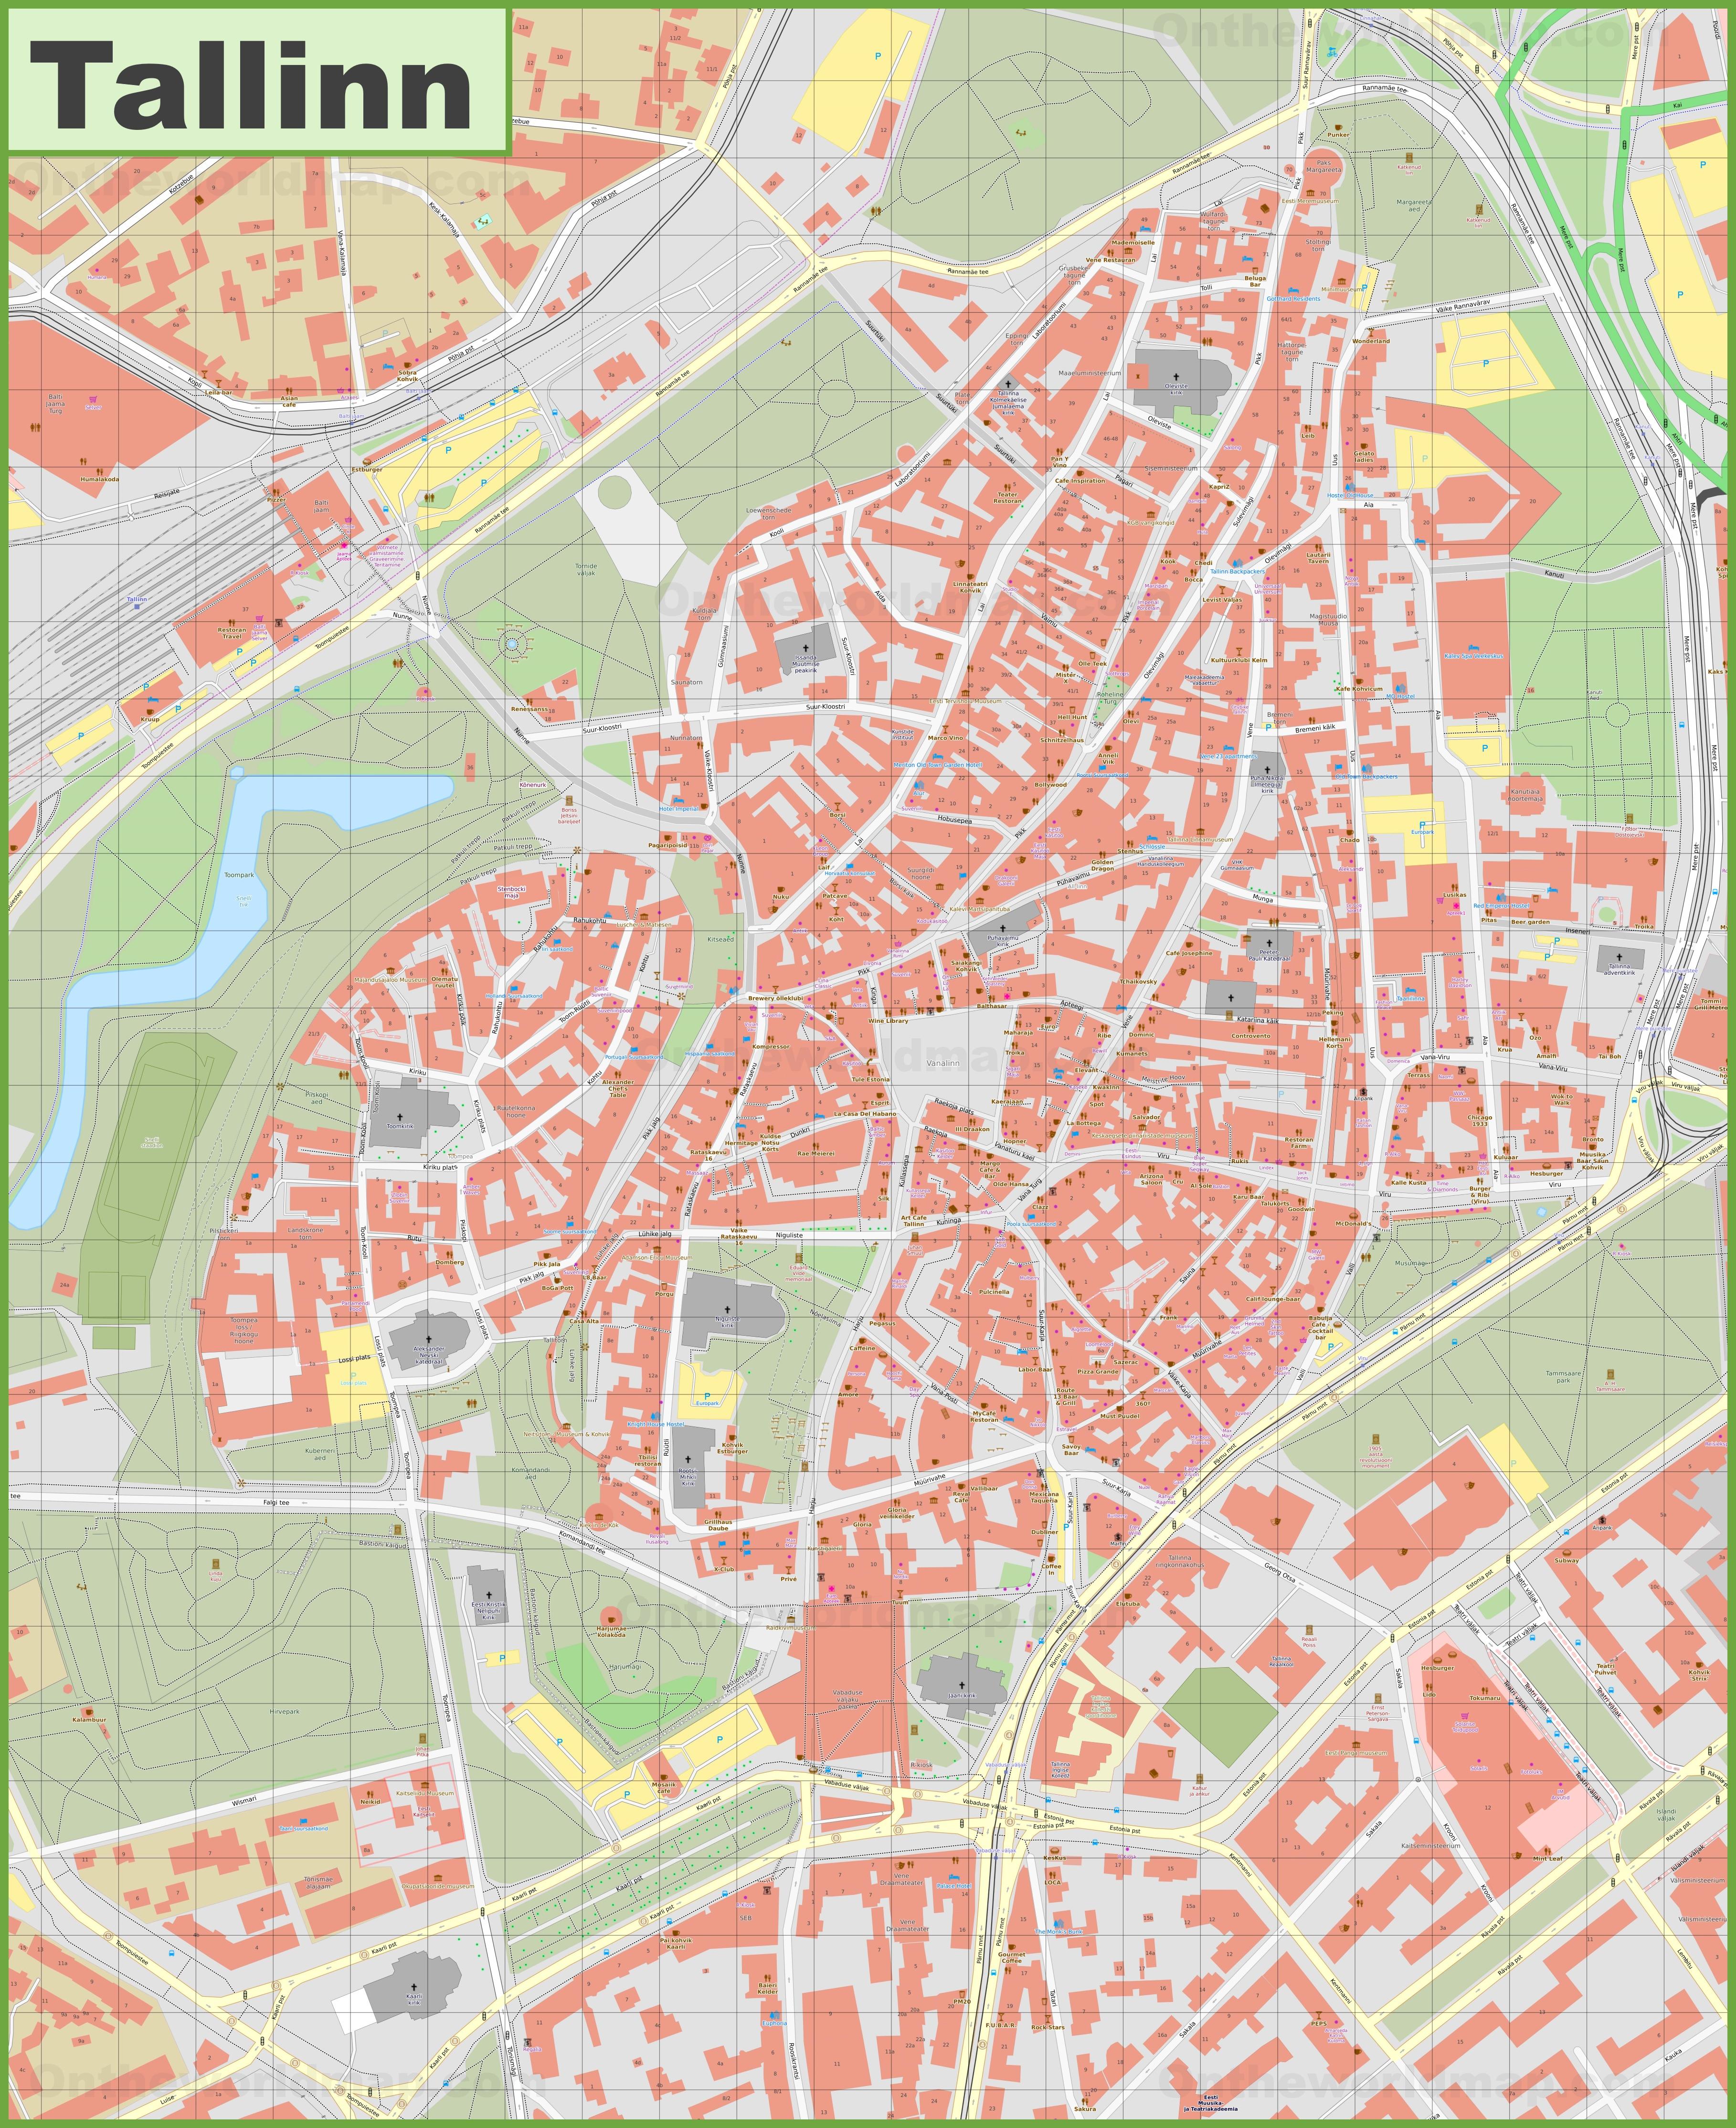 City map Tallinn Estonia